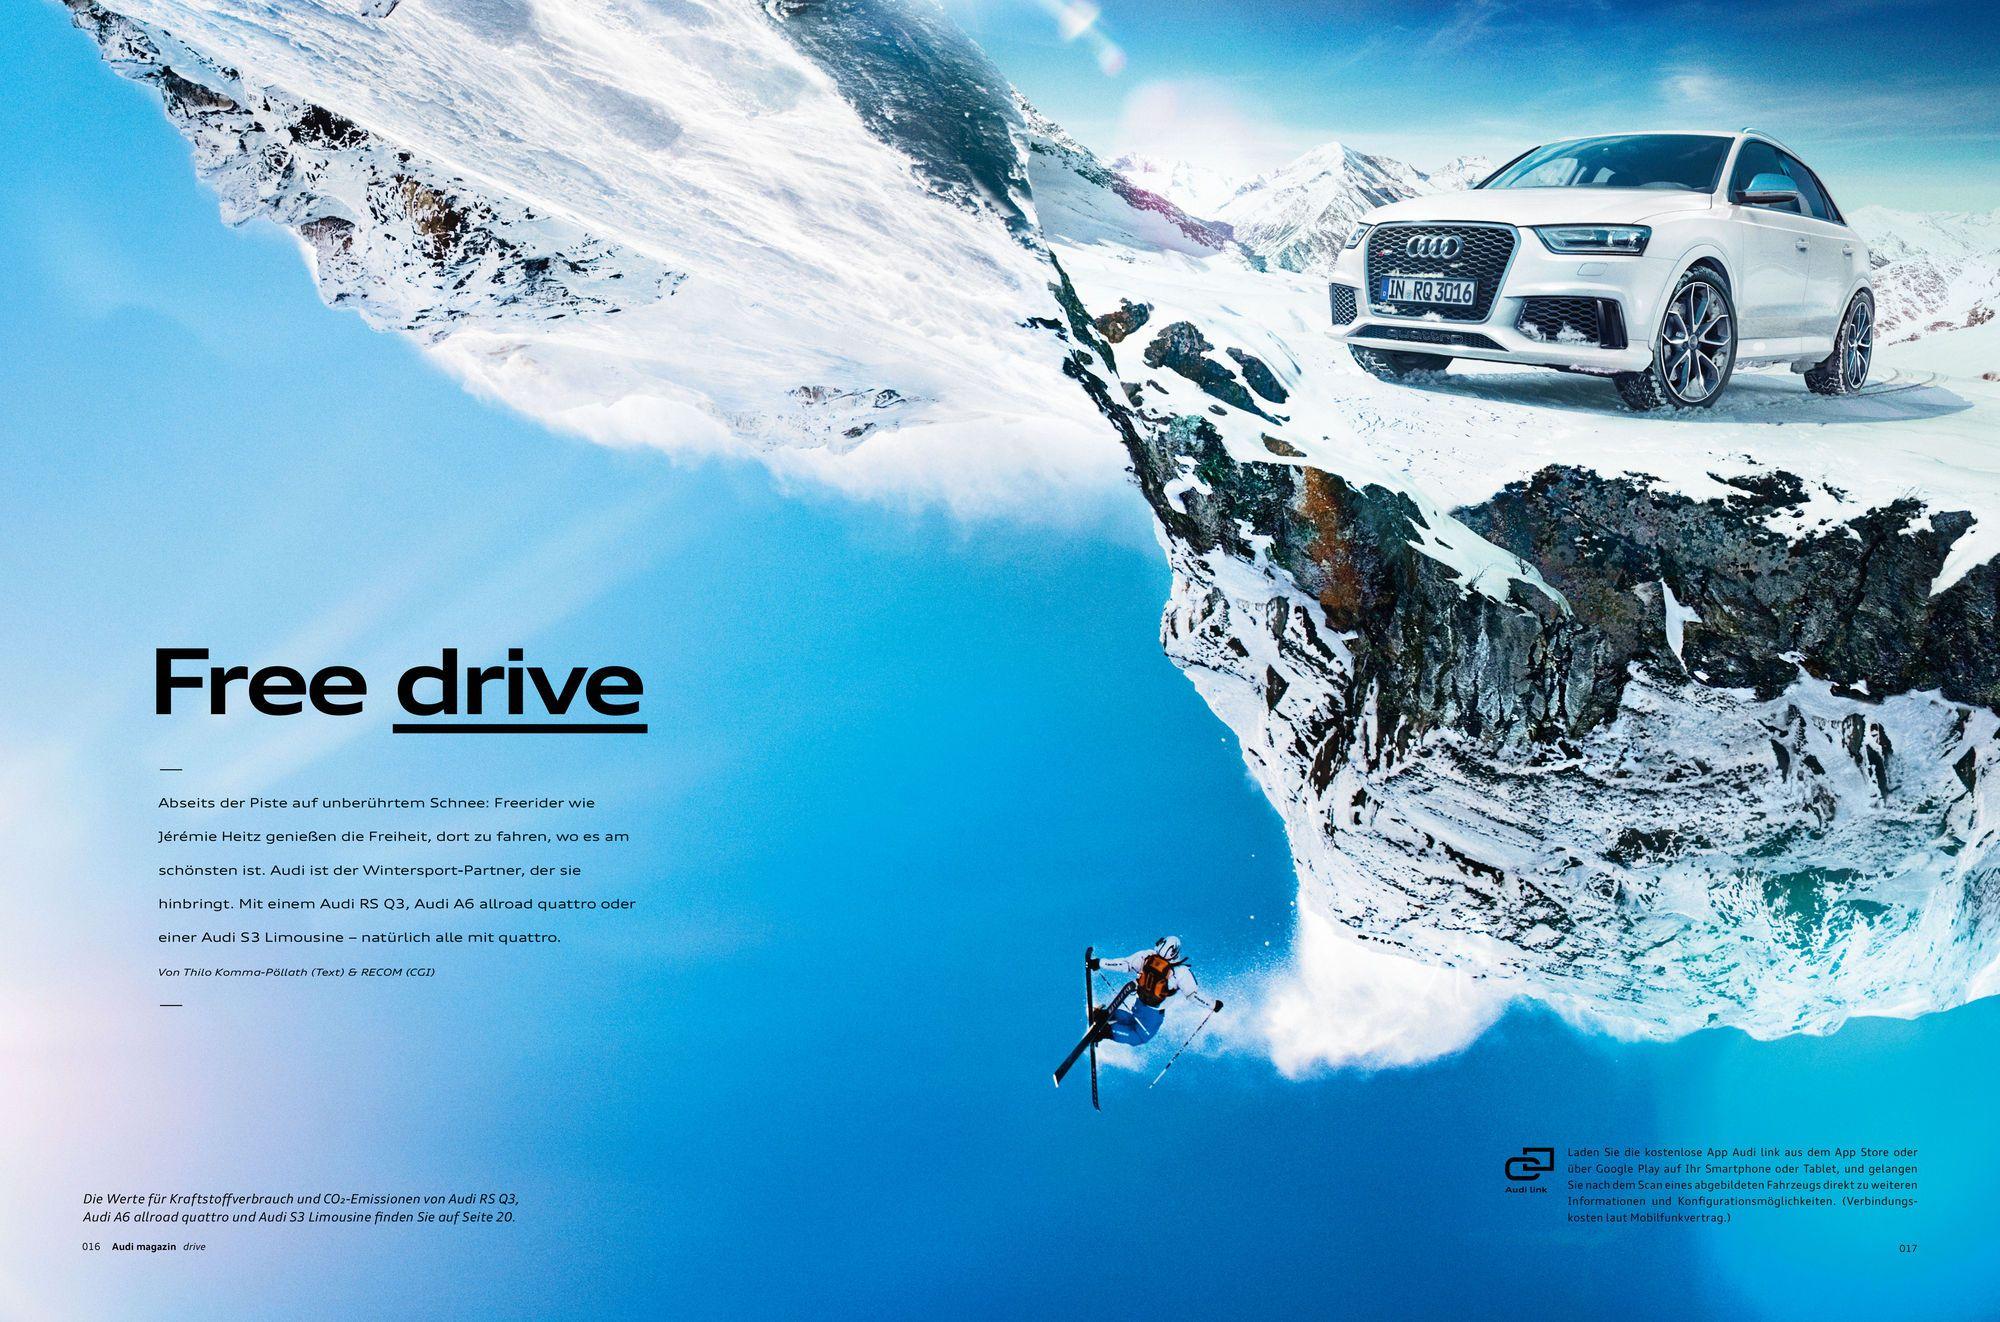 RECOM CGI : AUDI Magazin 01/2014 | RECOM GmbH & Co. KG | presented by GoSee ©